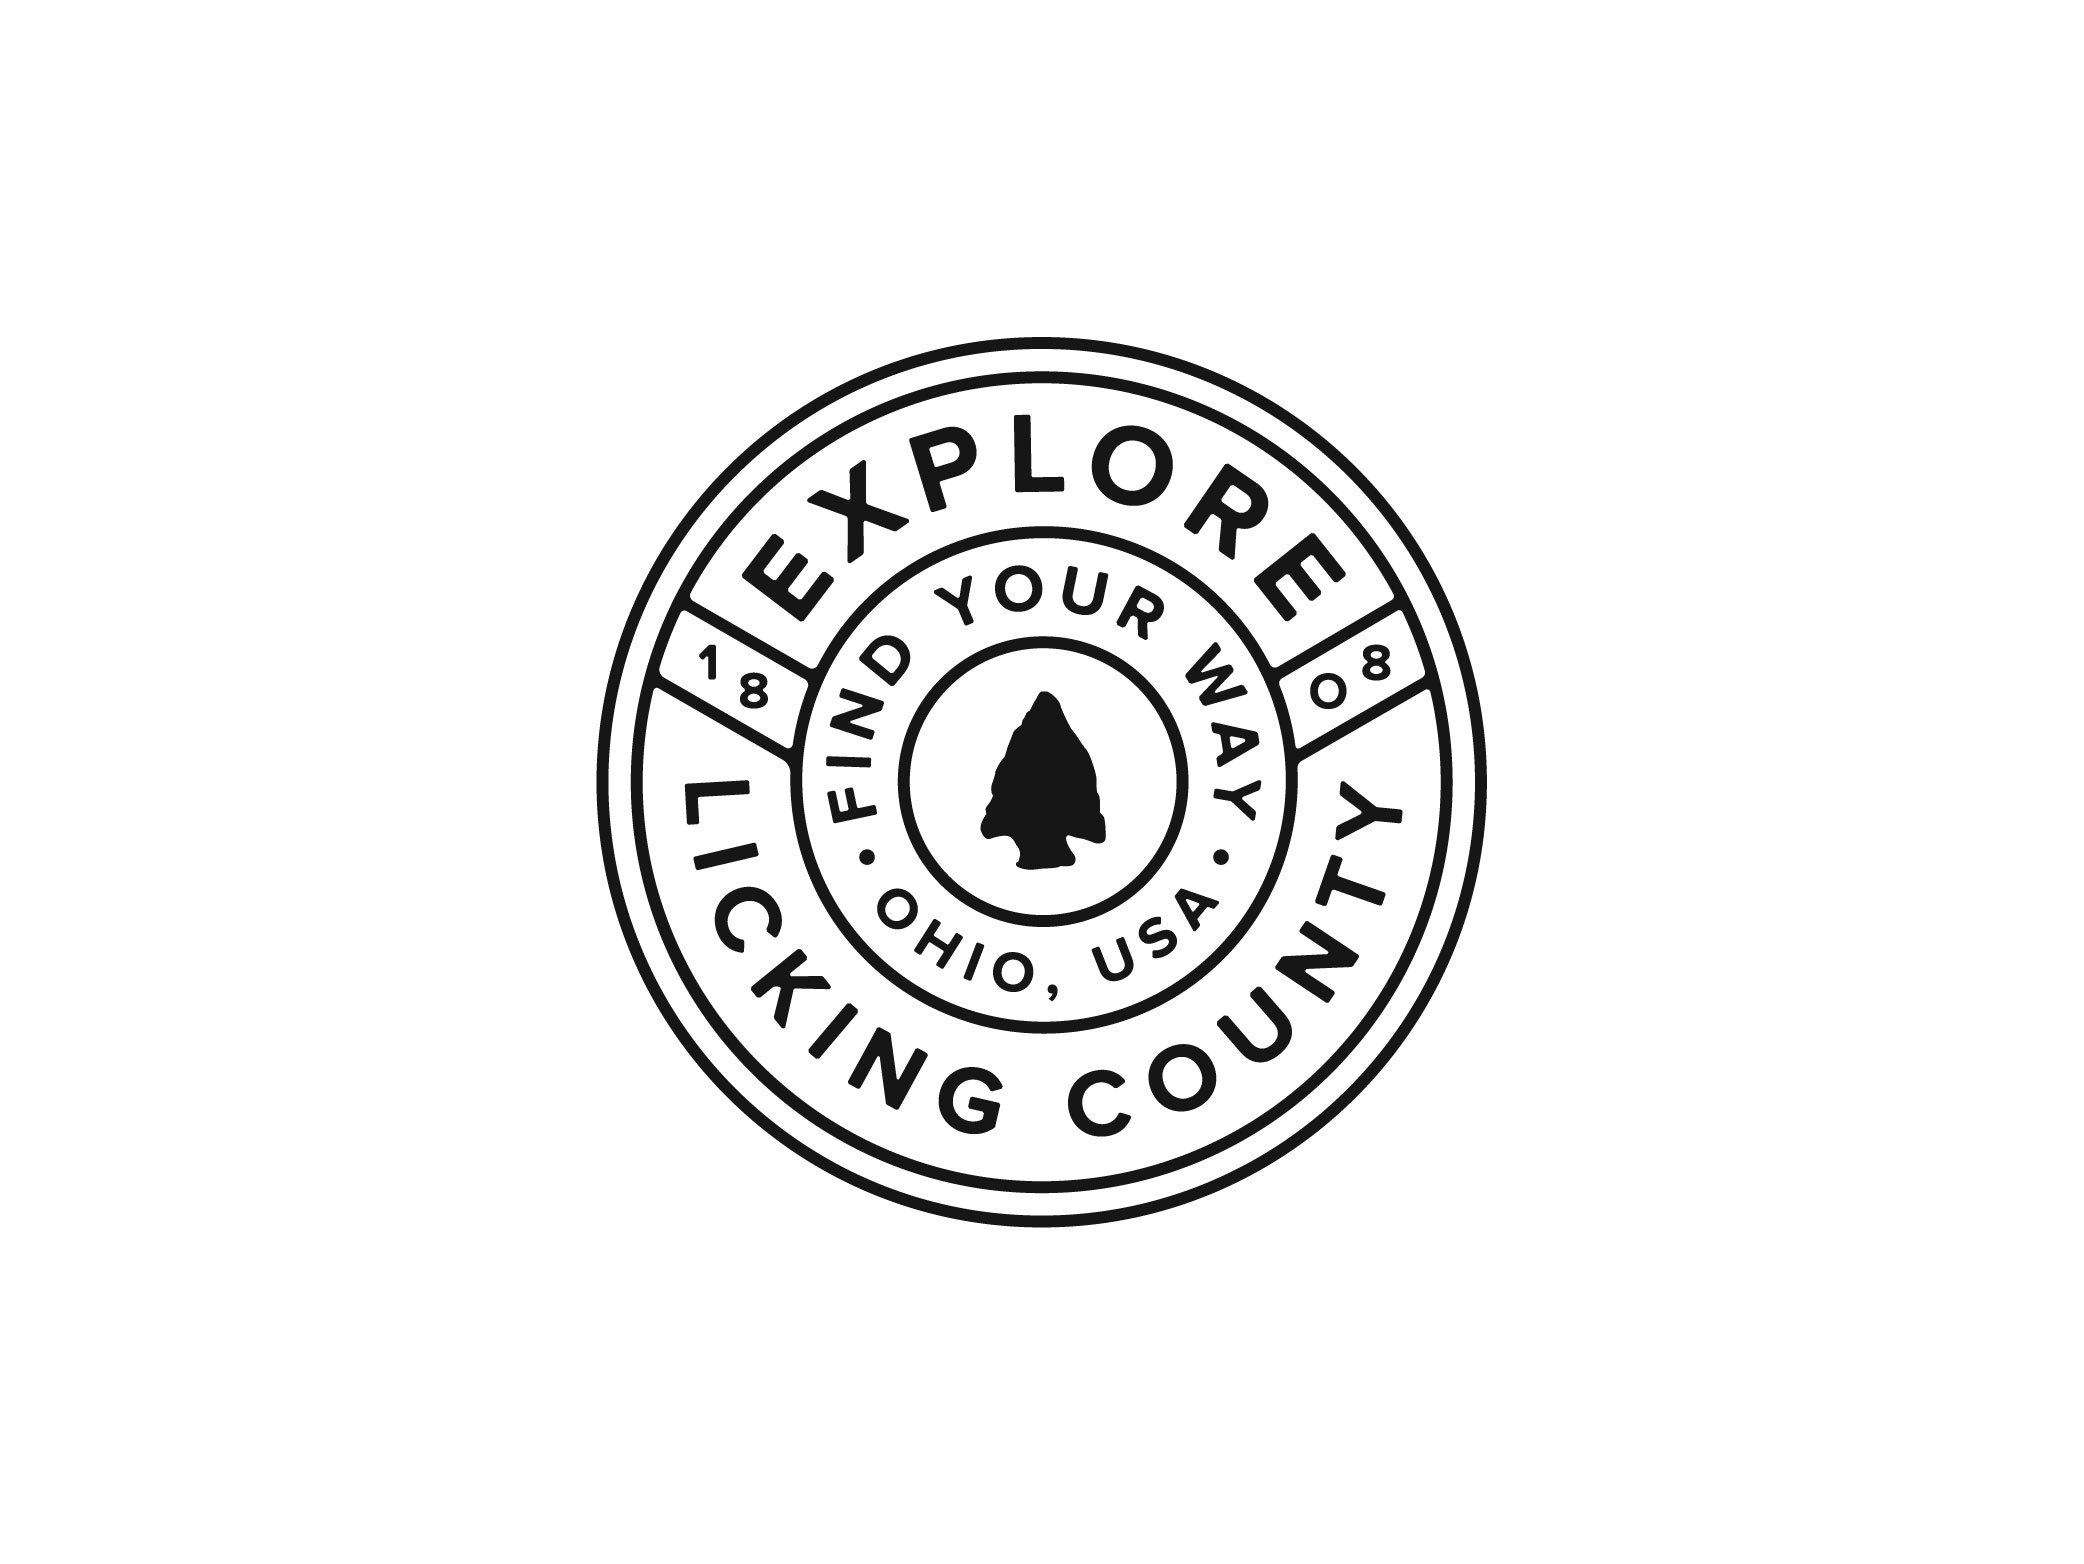 Studio Freight - Explore Licking County Icon